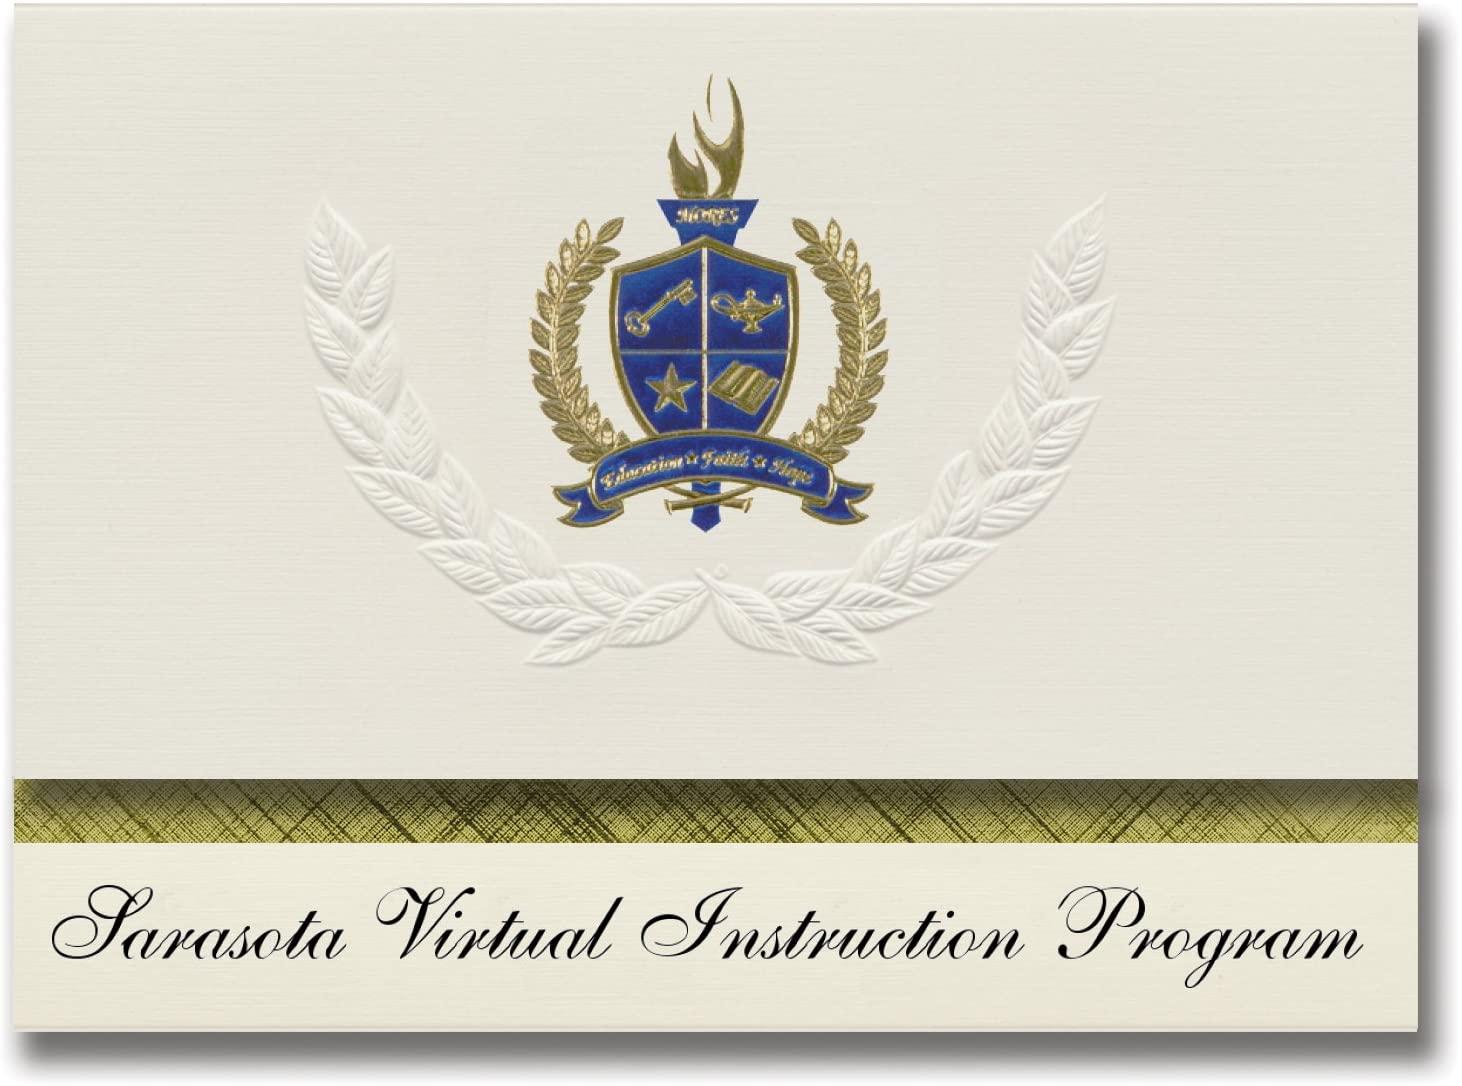 Signature Announcements Sarasota Virtual Instruction Program (Sarasota, FL) Graduation Announcements, Presidential Basic Pack 25 with Gold & Blue Metallic Foil seal